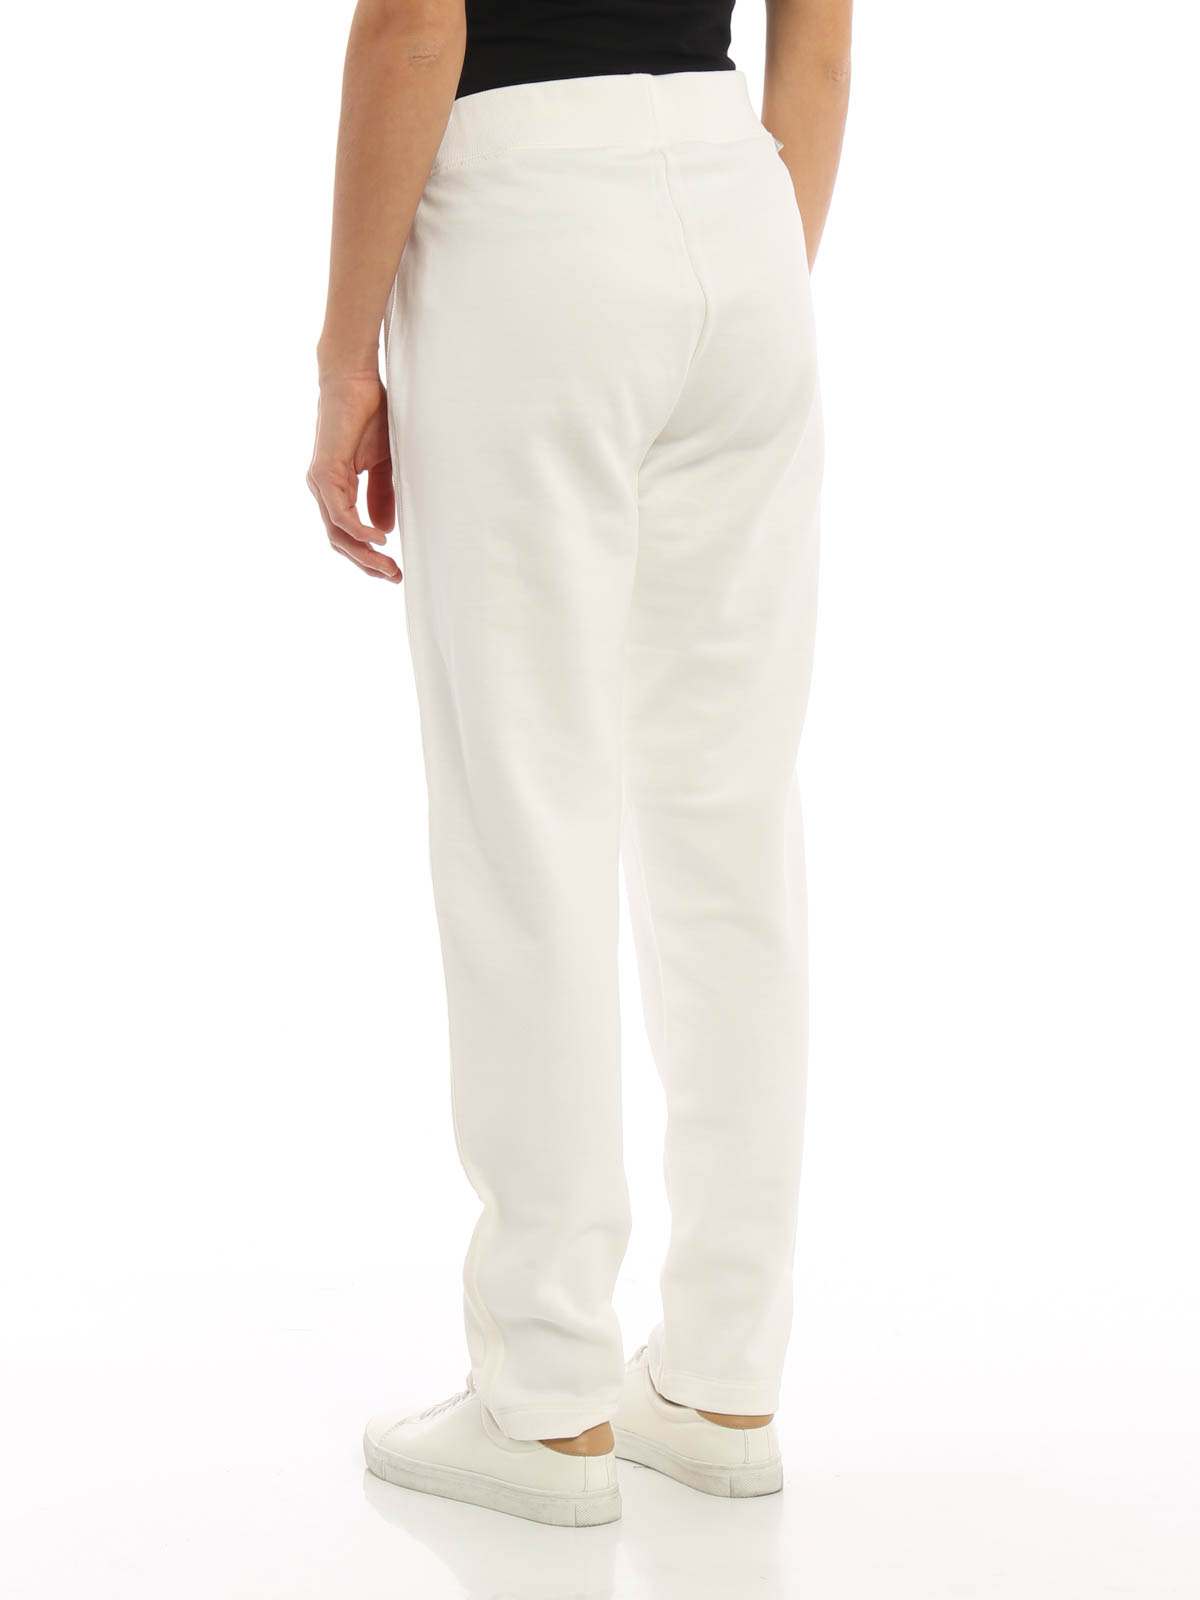 elige mejor valor fabuloso Reino Unido Moncler - Pantalón Chándal Blanco Para Mujer - Pantalones ...